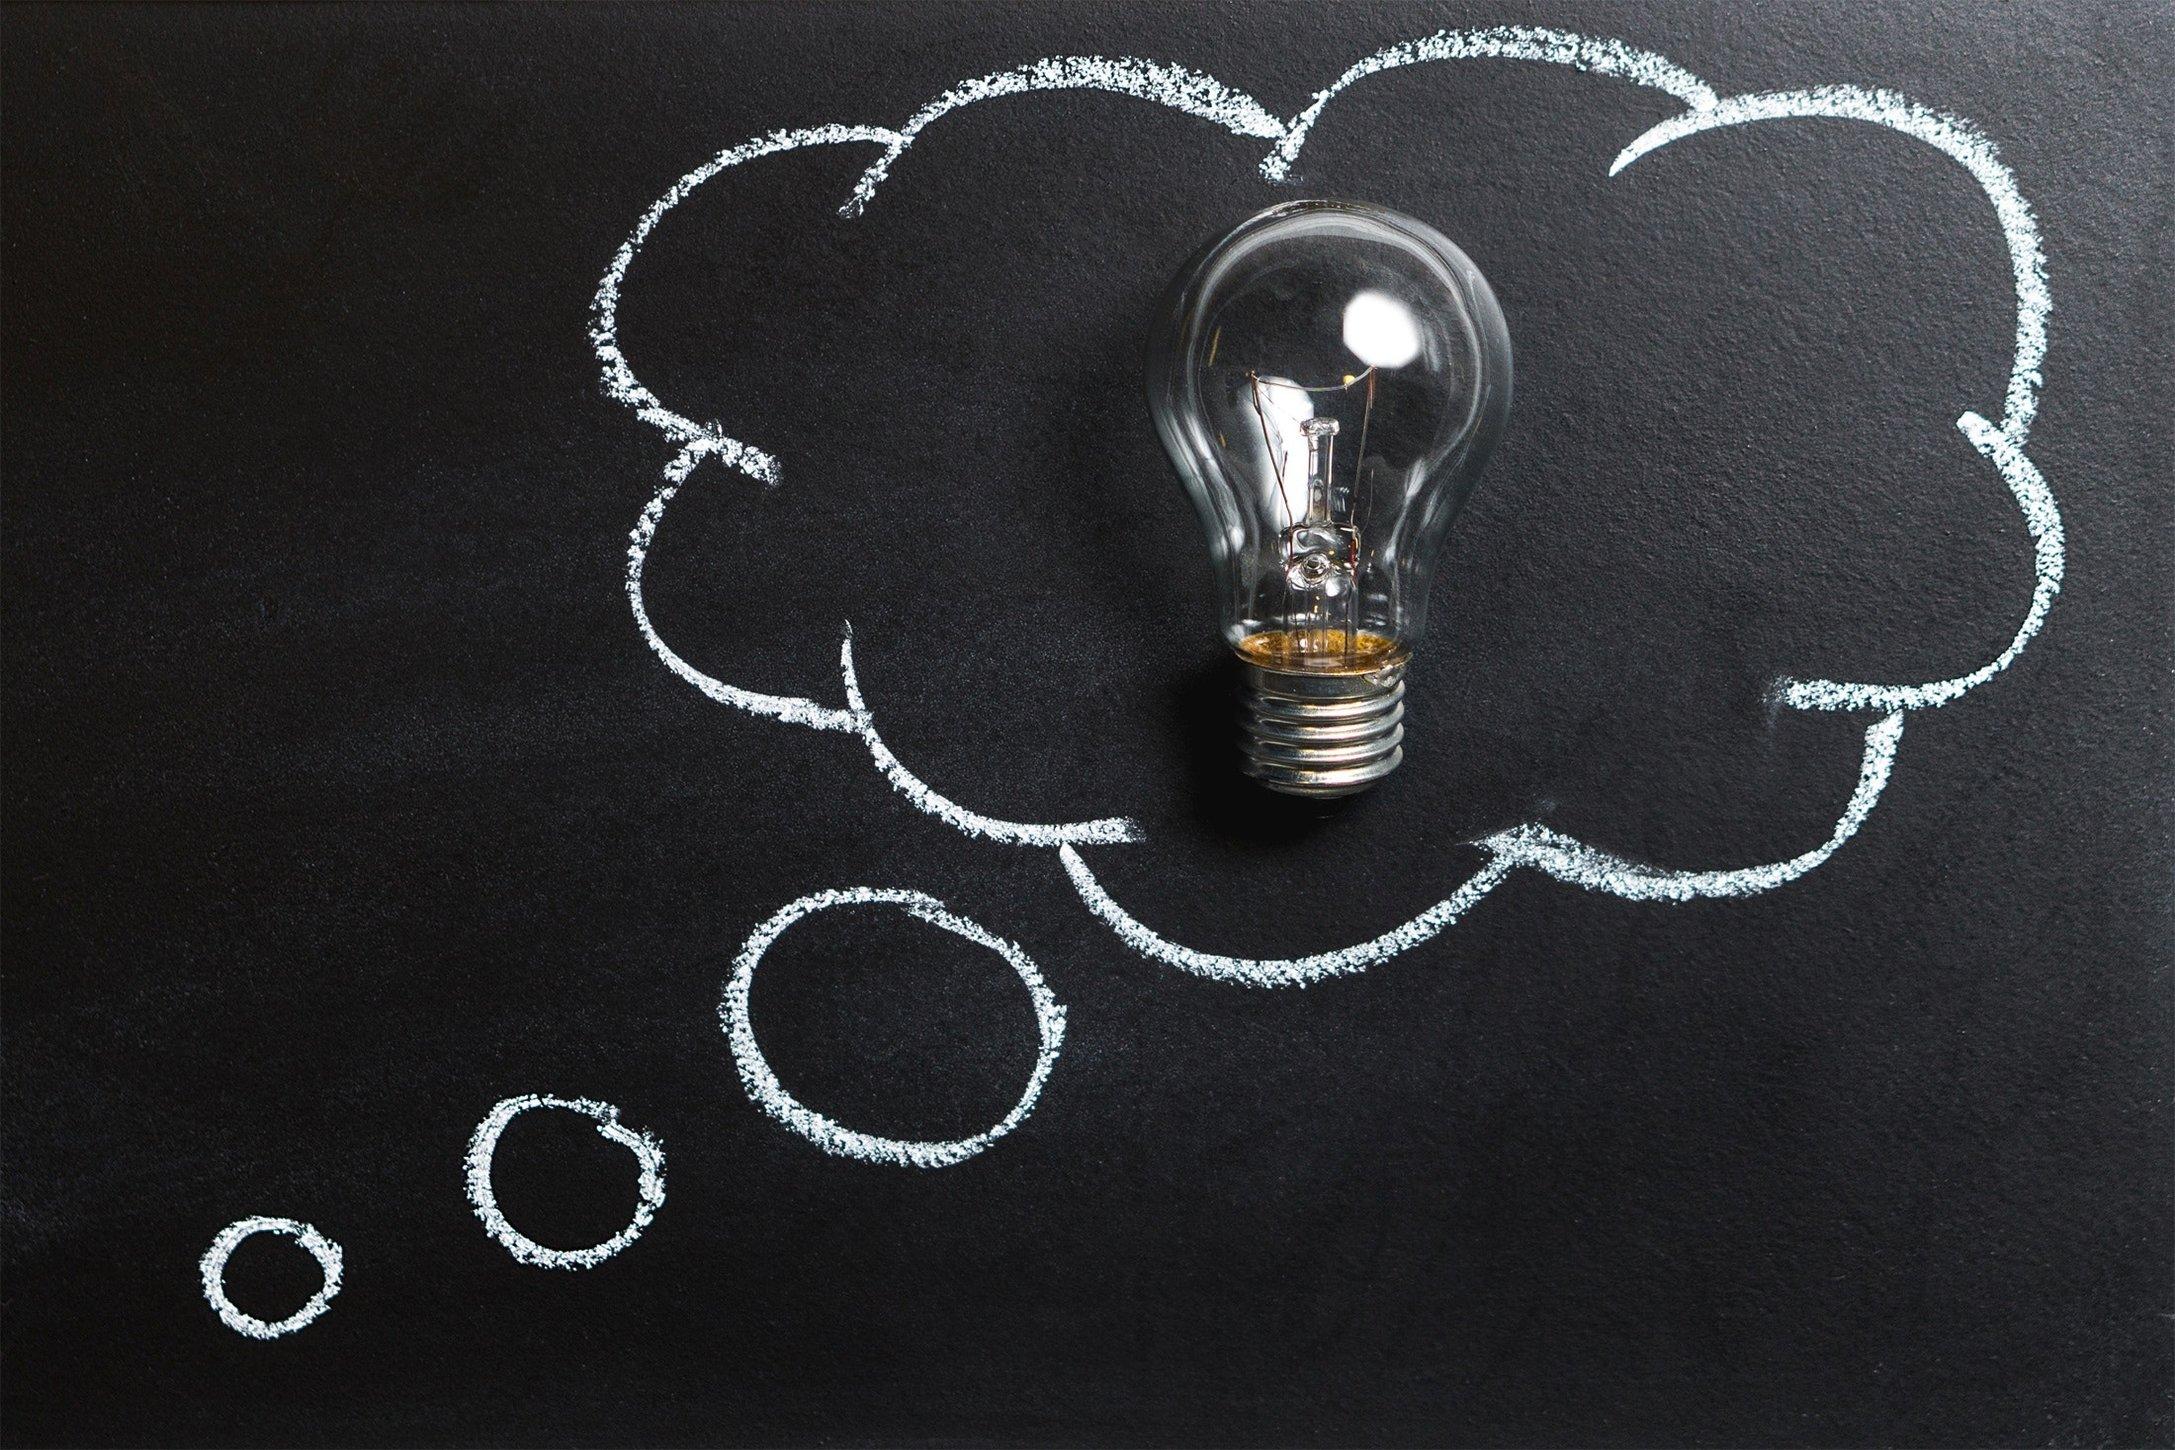 Materials: Critical thinking -